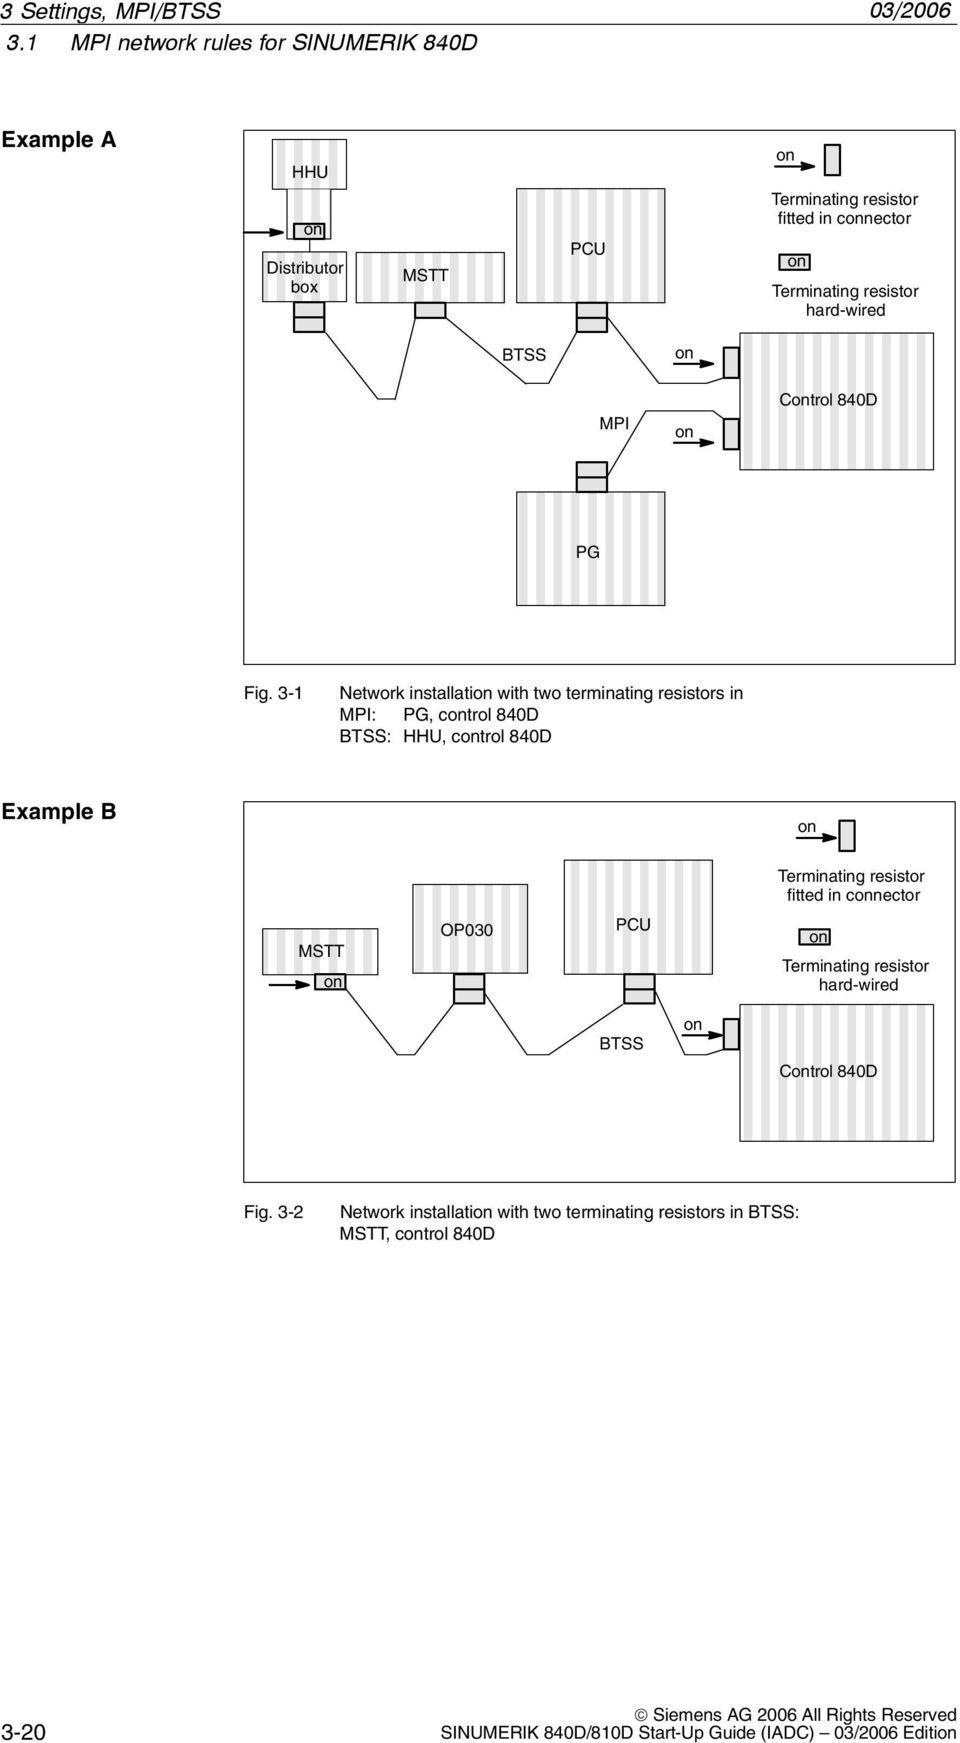 medium resolution of terminating resistor fitted in connector on terminating resistor hard wired control 840d